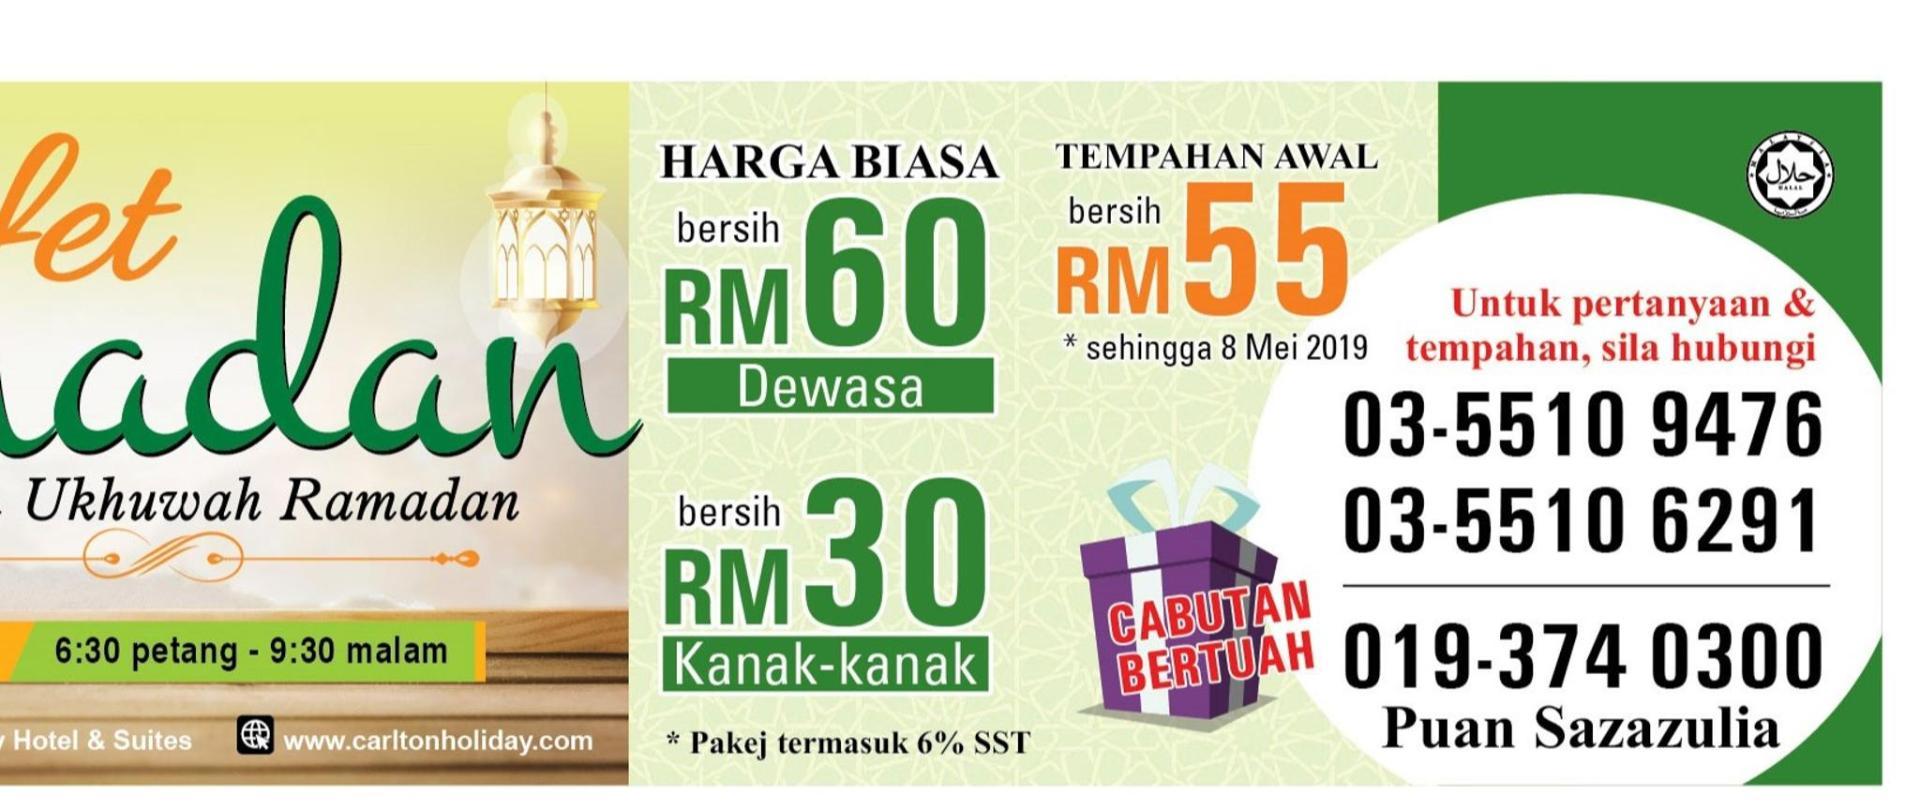 Carlton_Ramadan_Banner (3).jpg